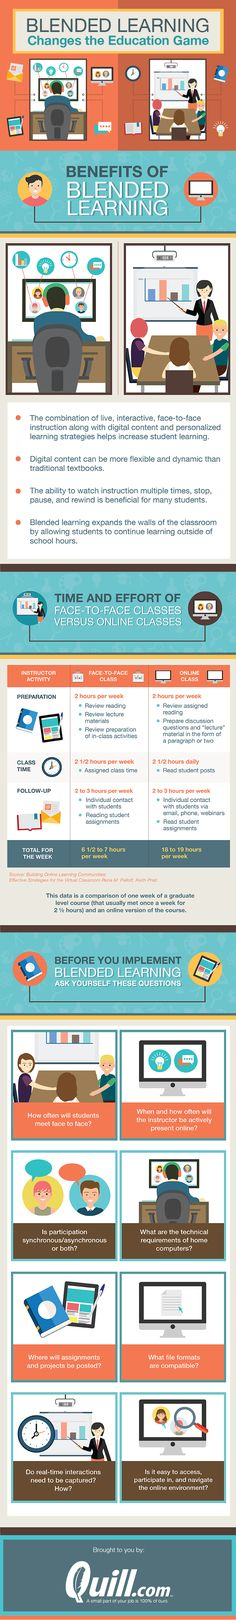 Blended Learning Blog Infographic 1